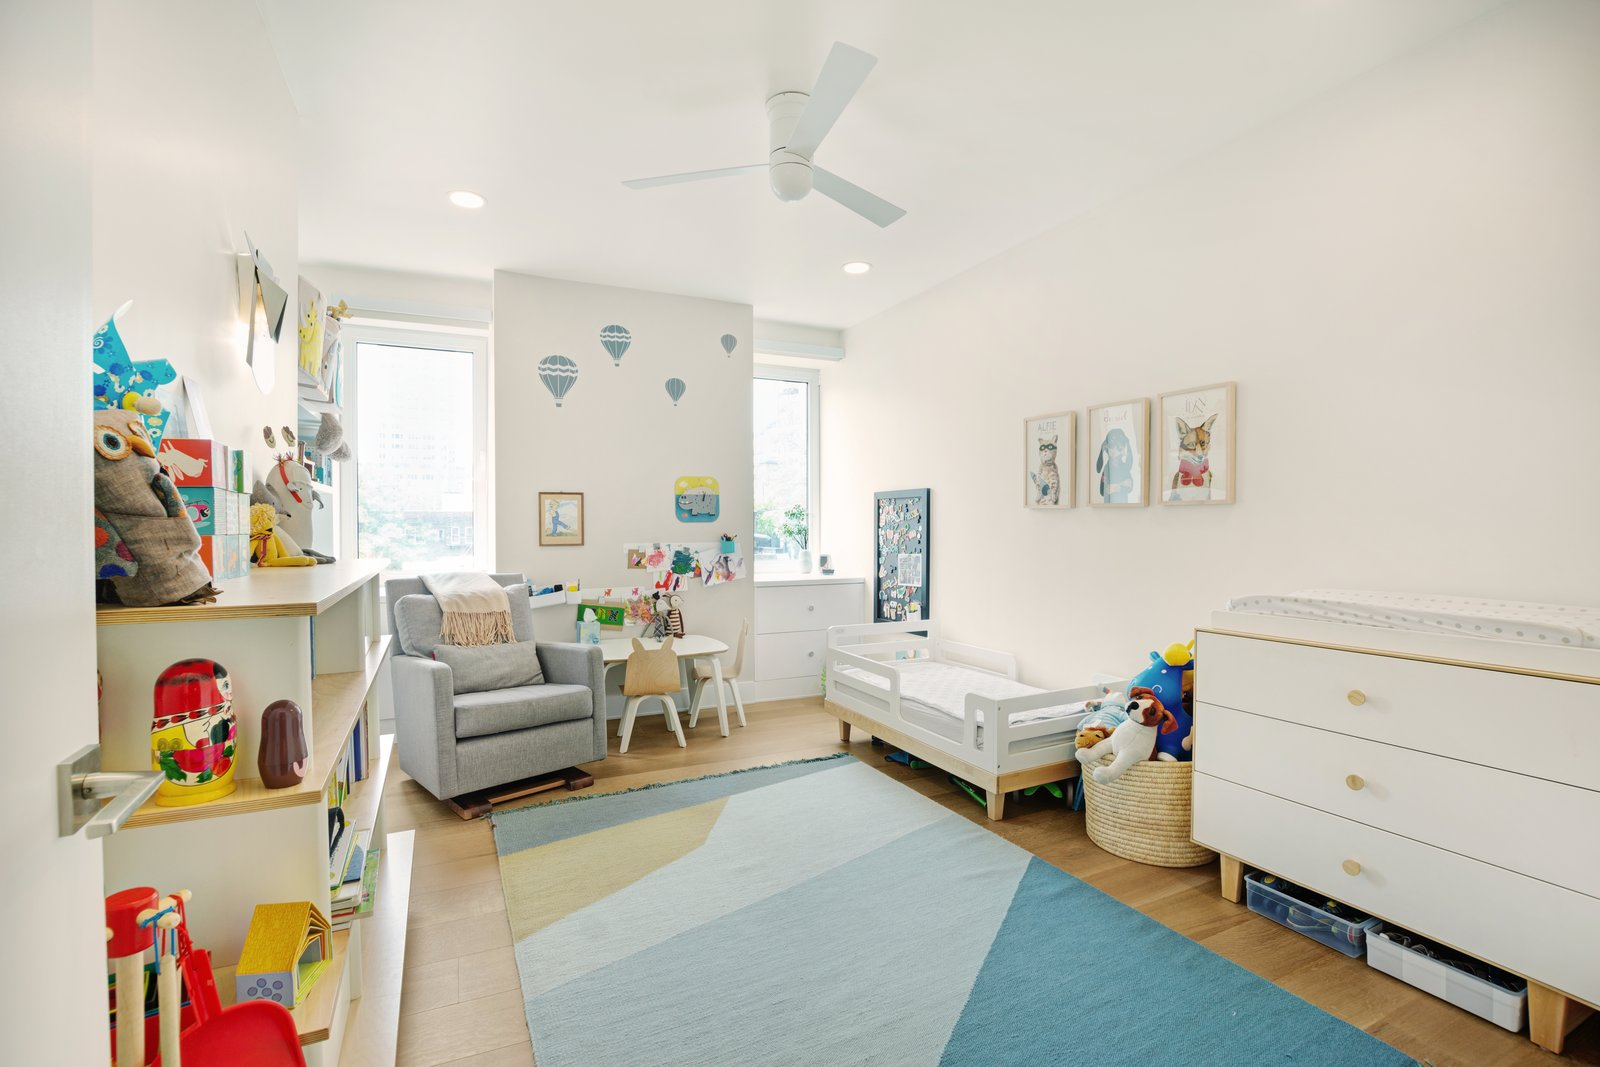 Kids Room, Medium Hardwood Floor, Toddler Age, Neutral Gender, Dresser, Bed, Bedroom Room Type, Rug Floor, Desk, Shelves, and Chair  Photos from Greenwich Village Renovation